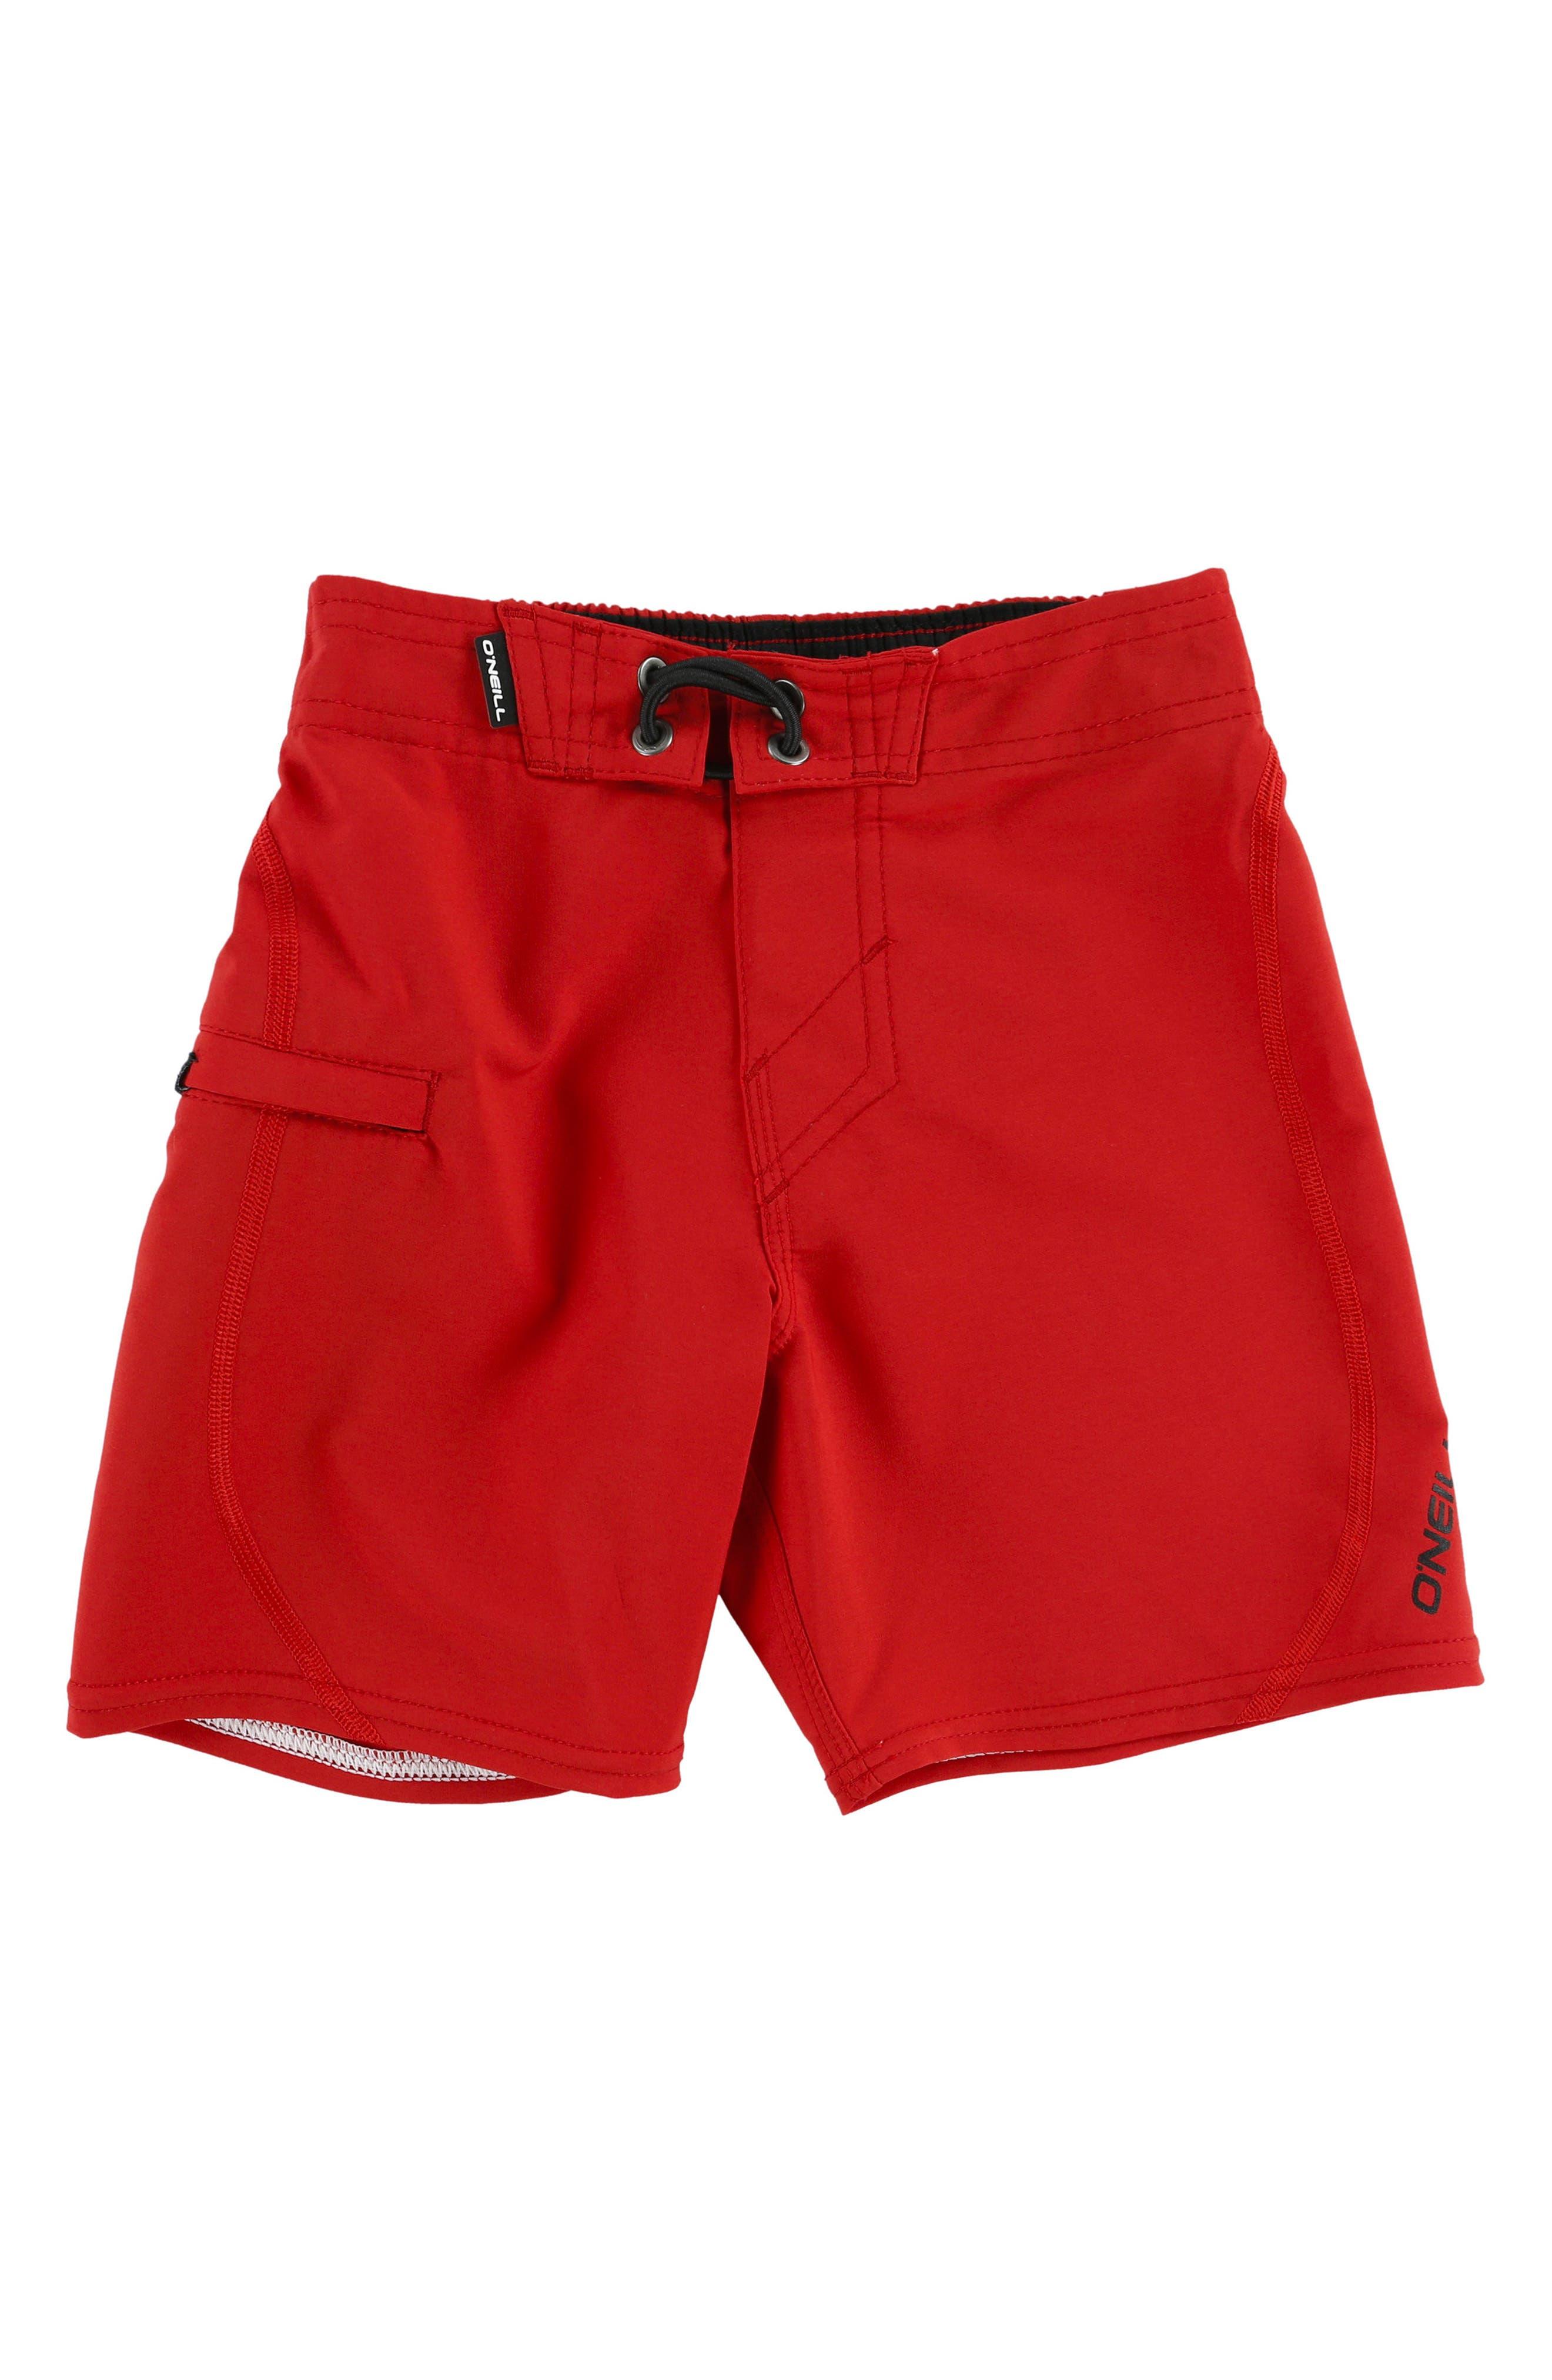 Hyperfreak S-Seam Board Shorts,                         Main,                         color, Red